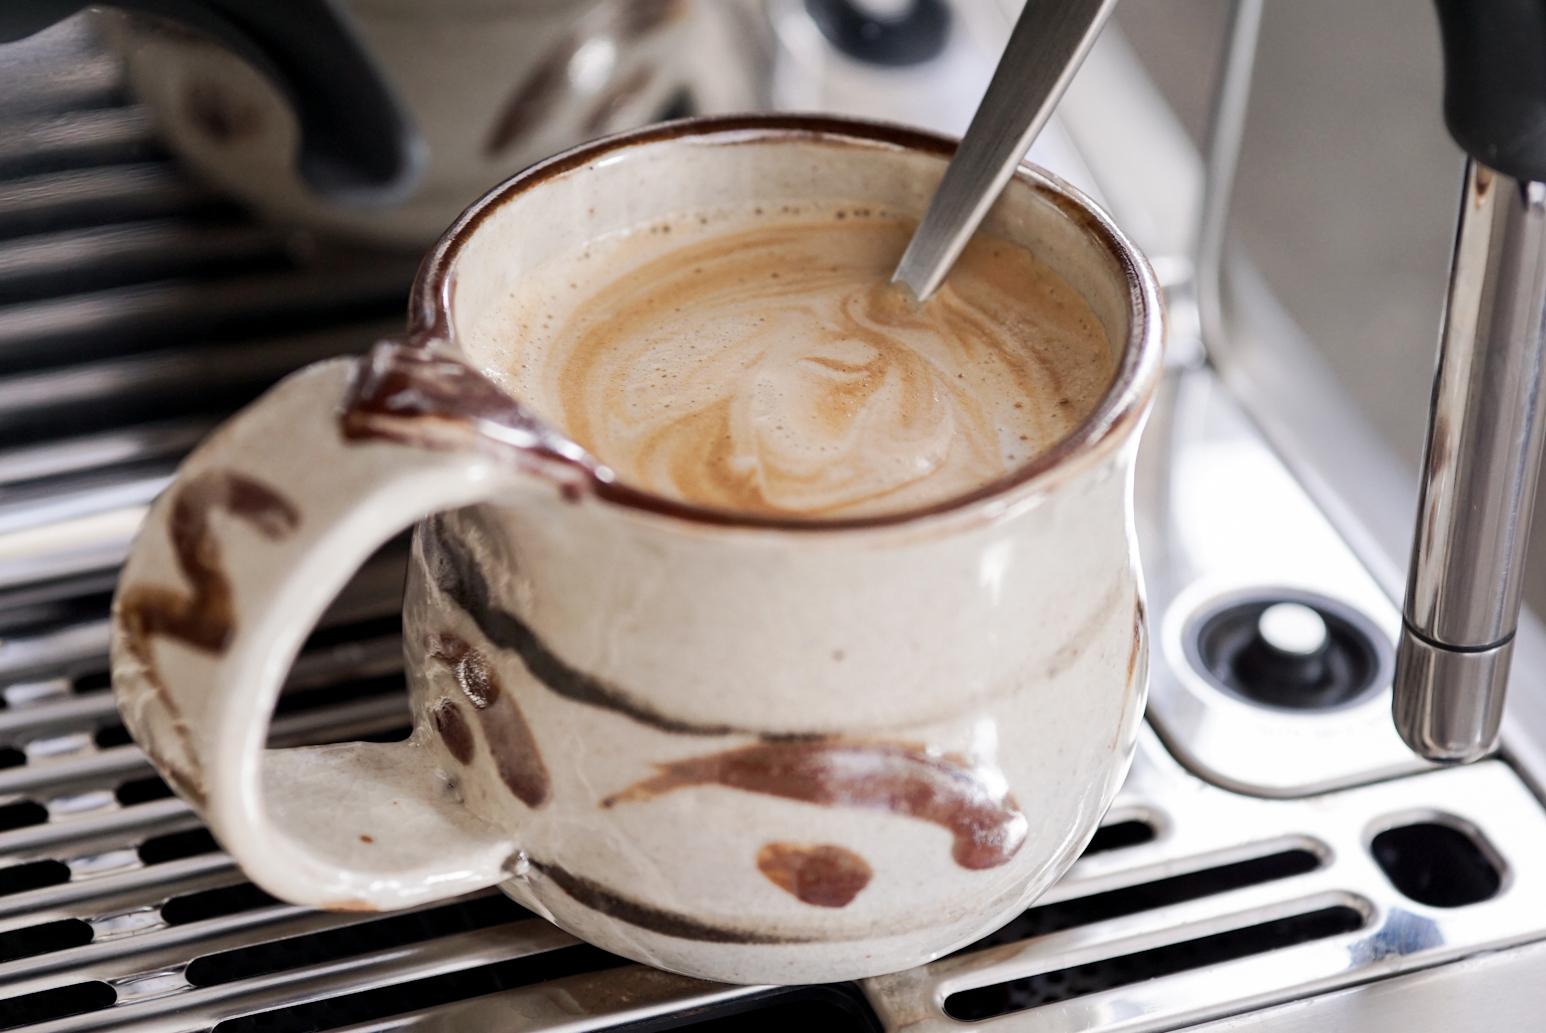 Breville Barista Touch latte